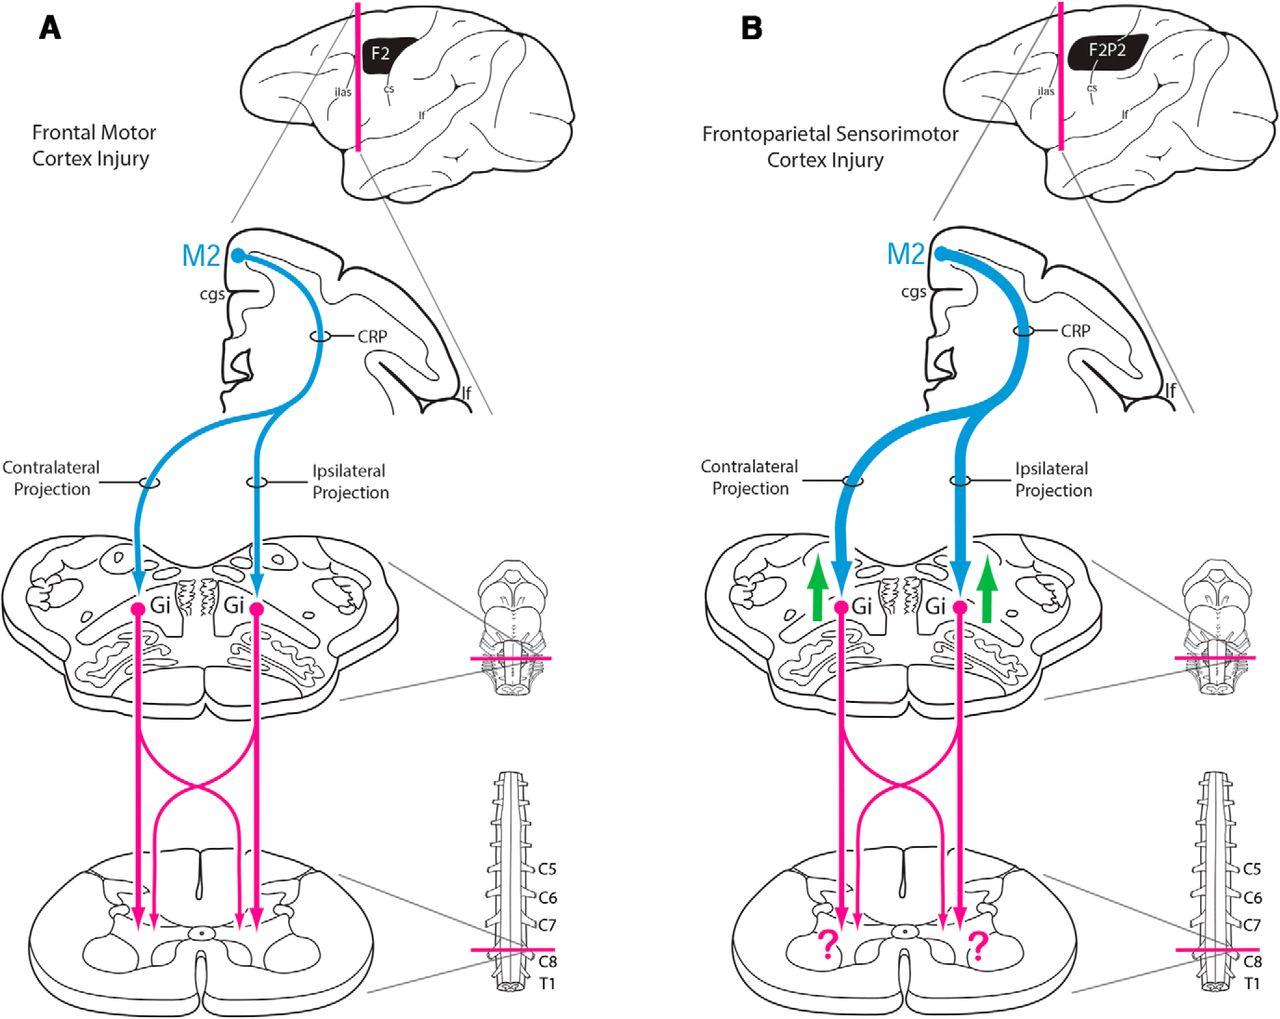 Hand Motor Recovery Following Extensive Frontoparietal Cortical ...